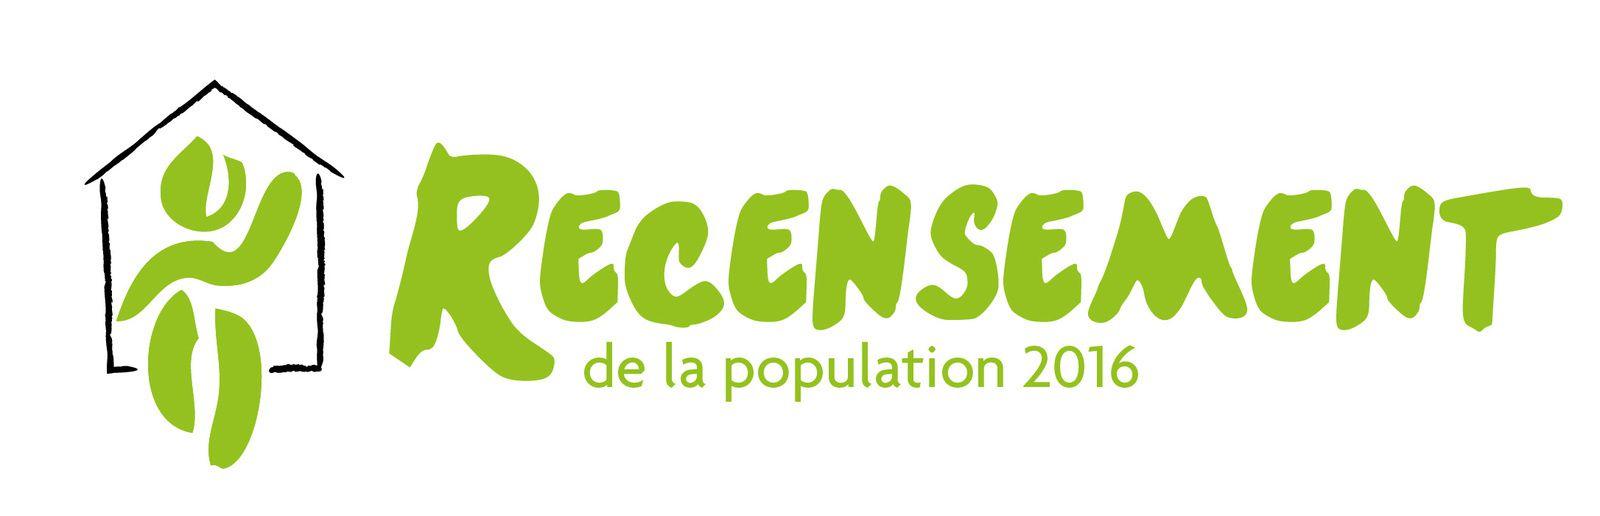 Recensement : campagne 2016 à Garancières